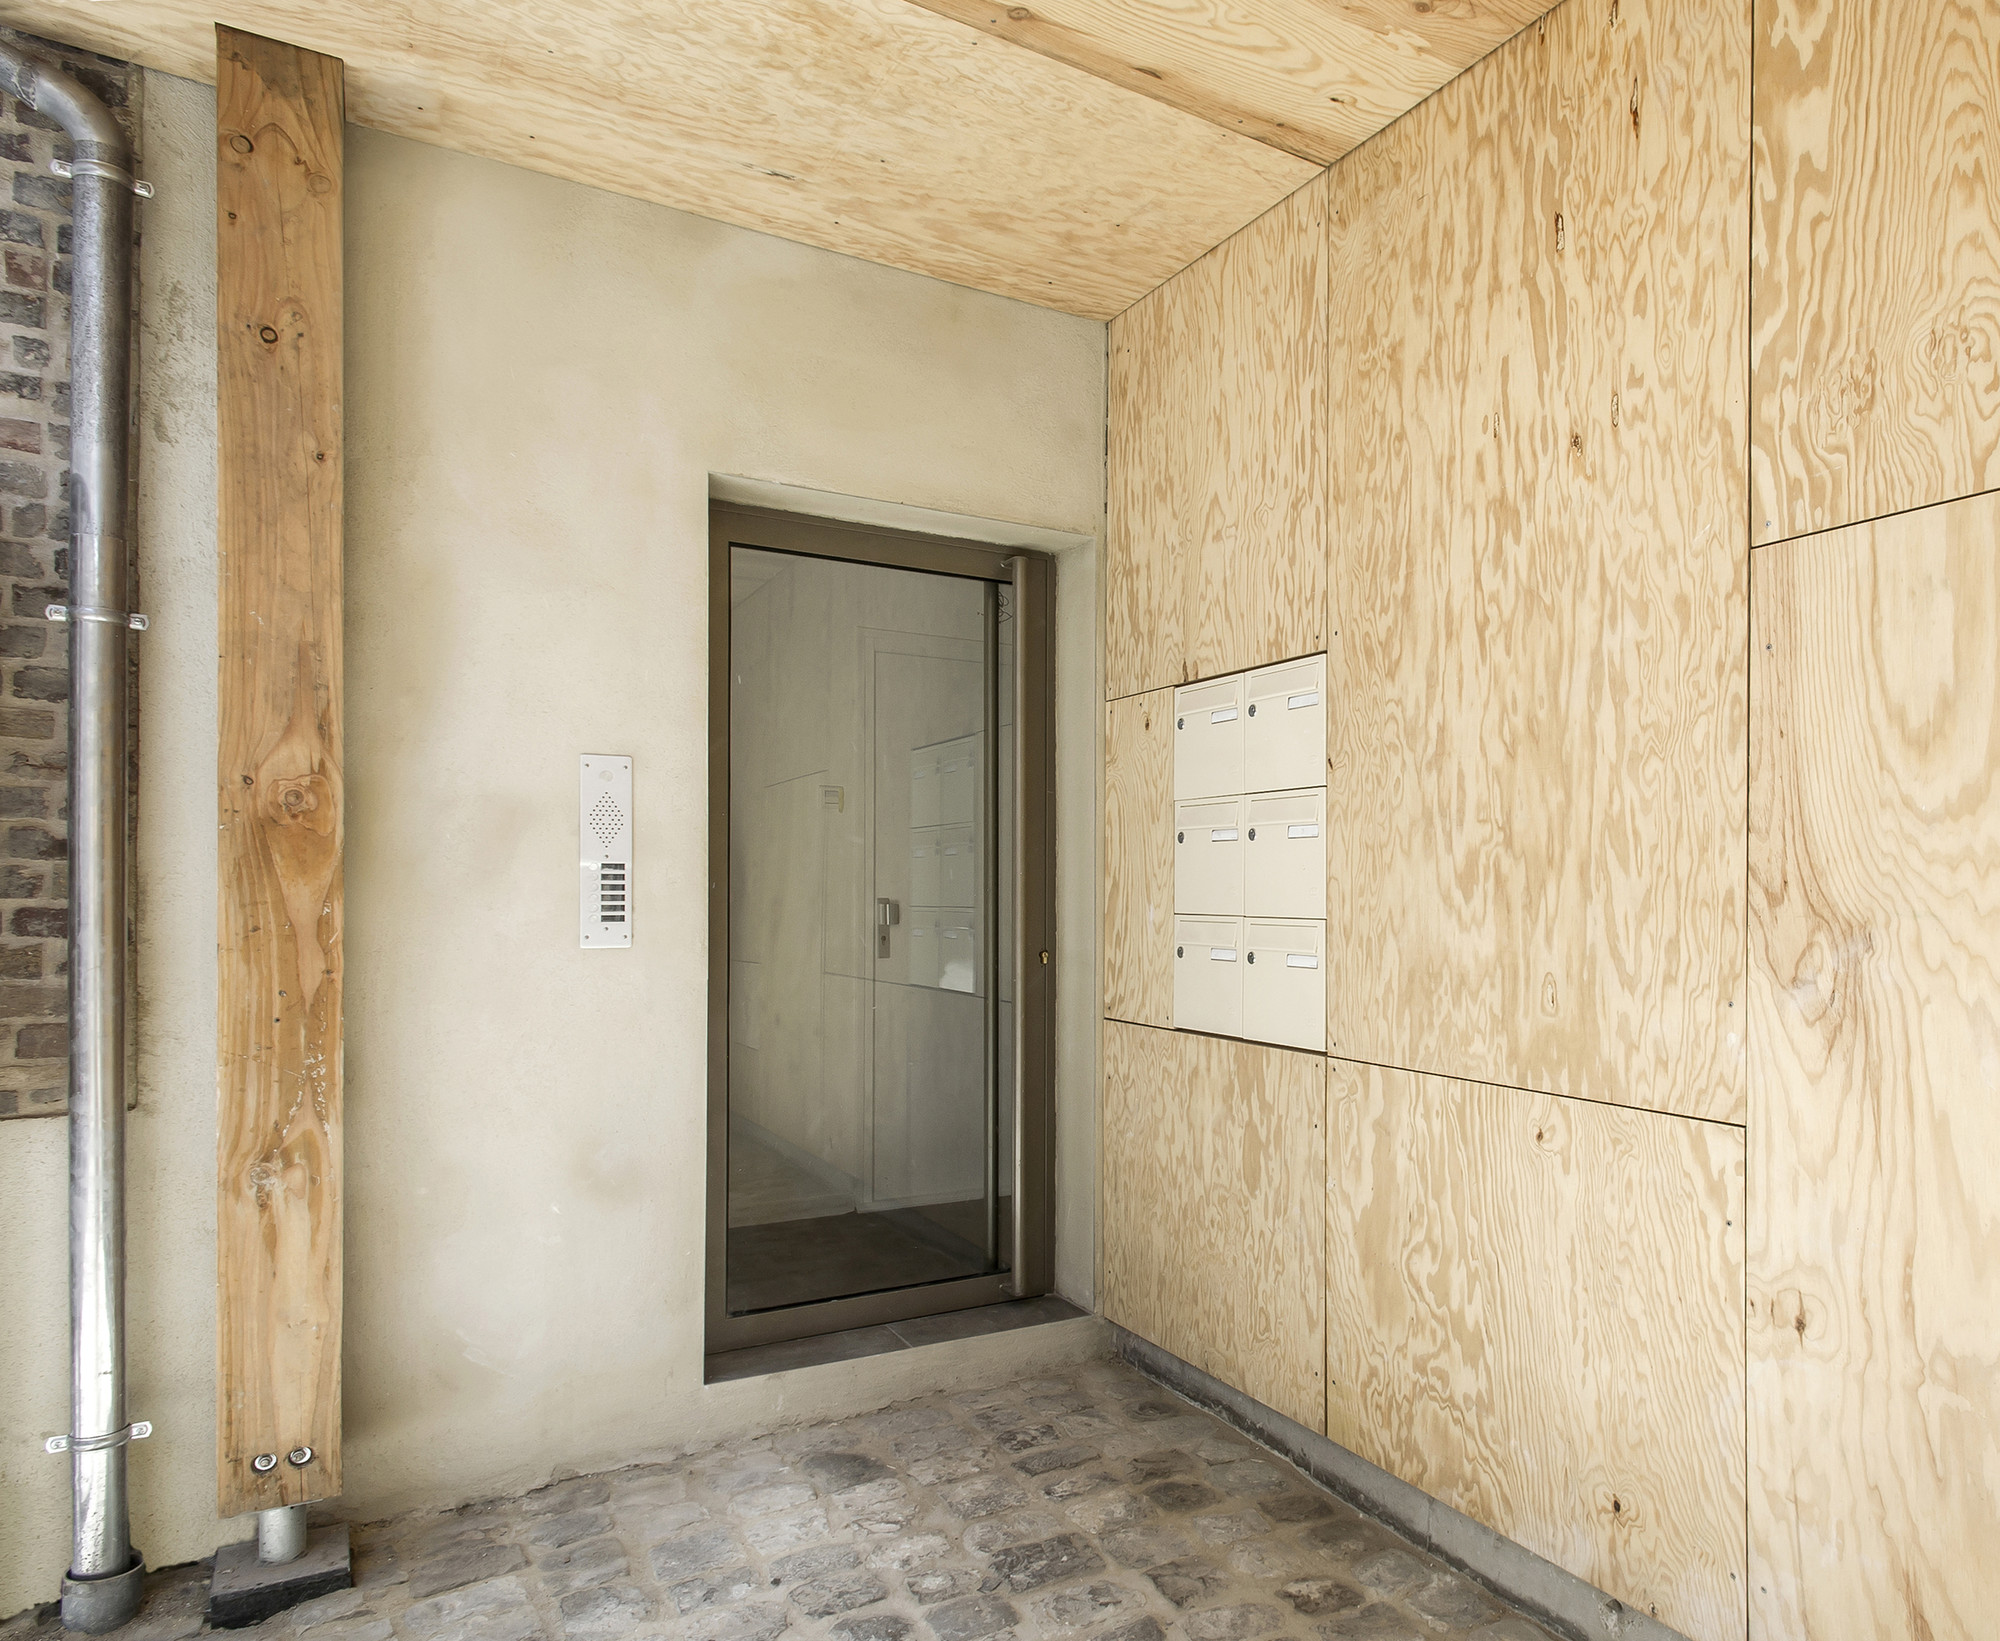 galer a de au bon coin ramdam architectes 12. Black Bedroom Furniture Sets. Home Design Ideas